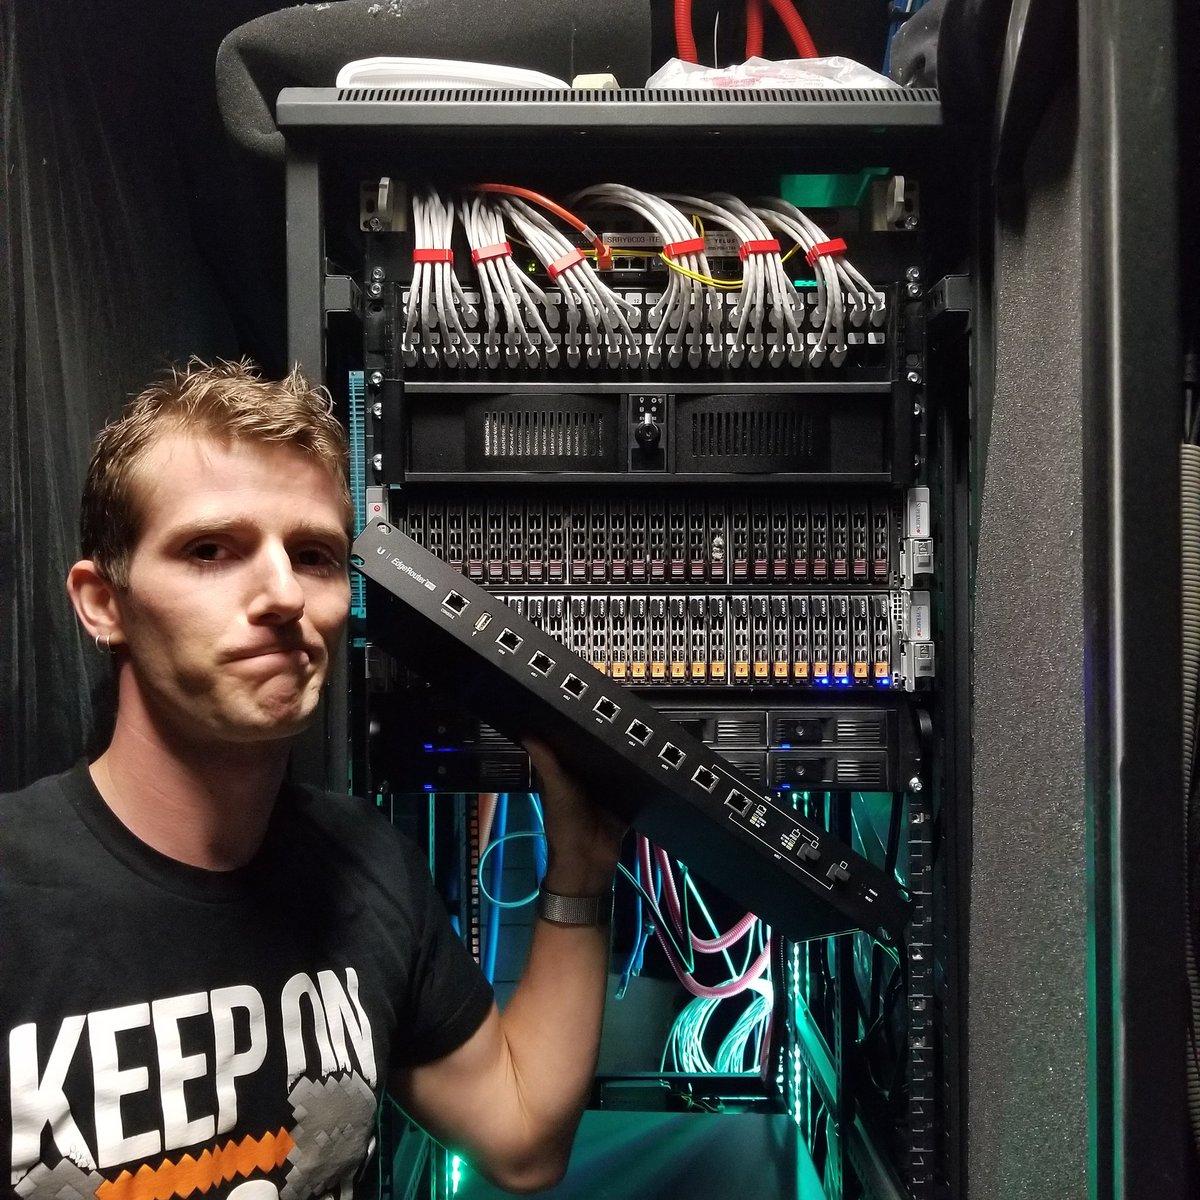 Linus Tech Tips on Twitter: